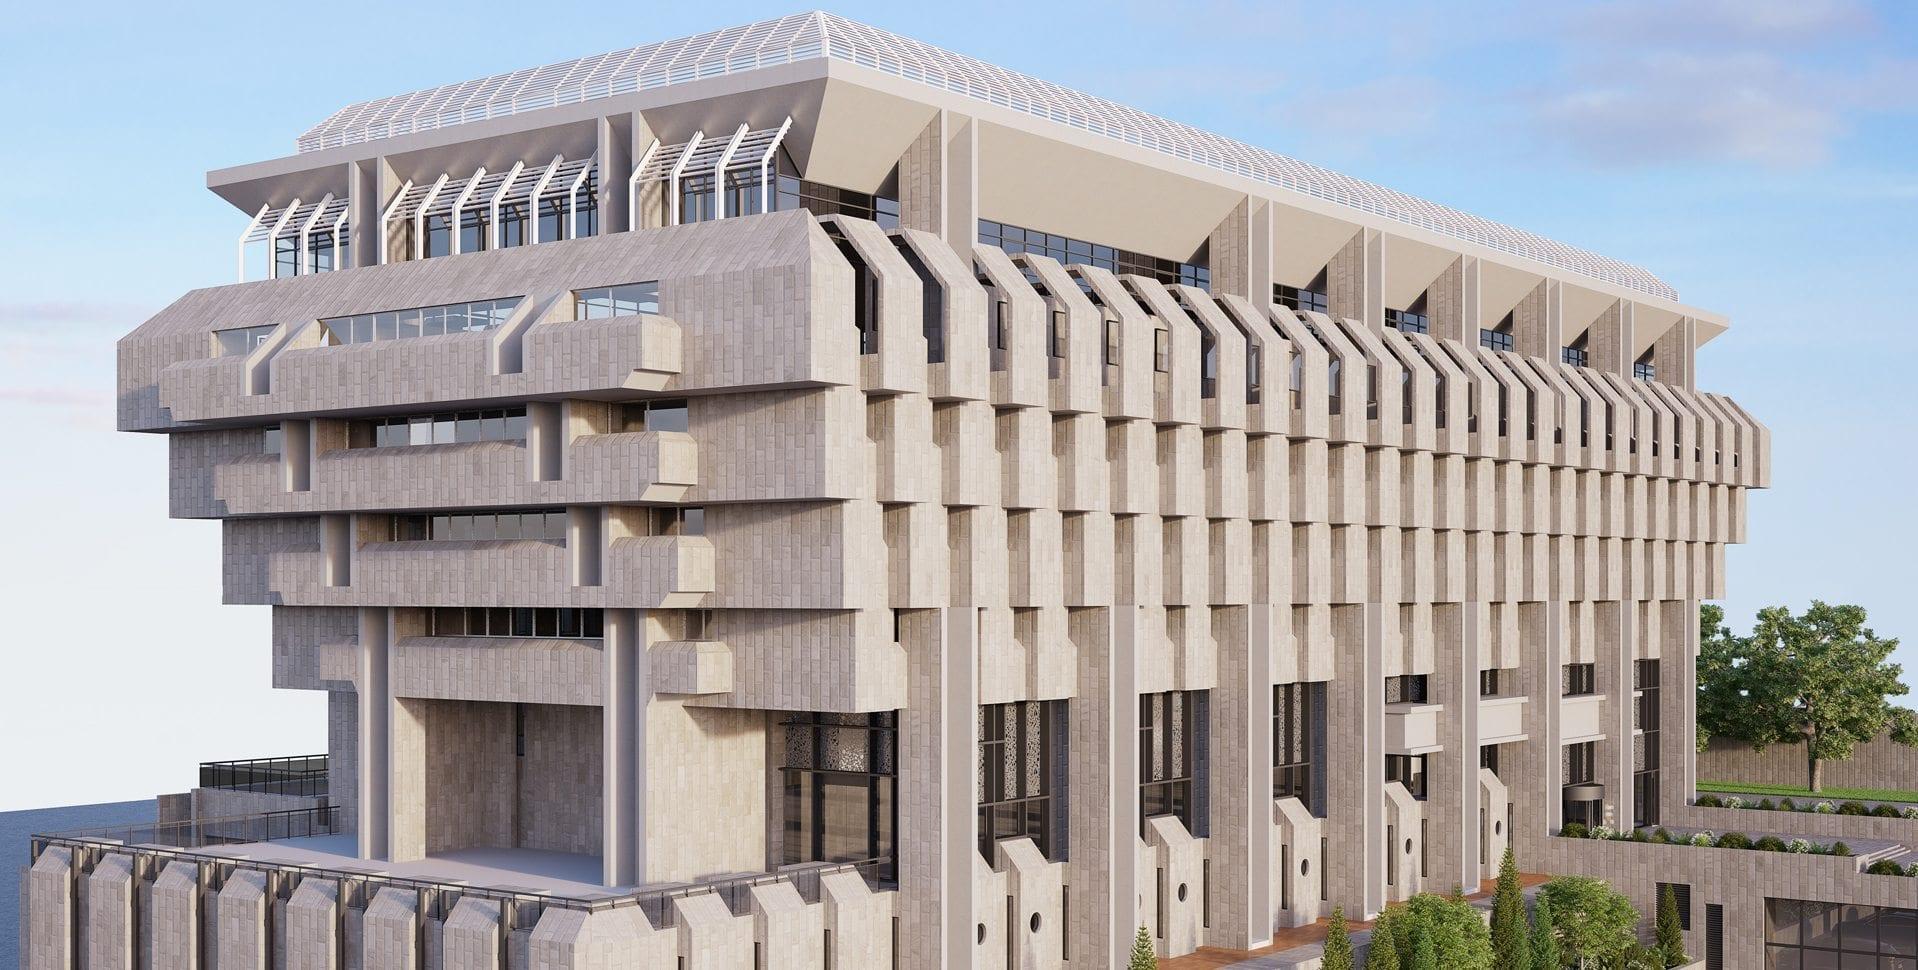 Maayan-Golan_Architectural-Visualization_exterior-visualization_bank-of-israel-jerusalem_side-elevation_dunski-architects_03